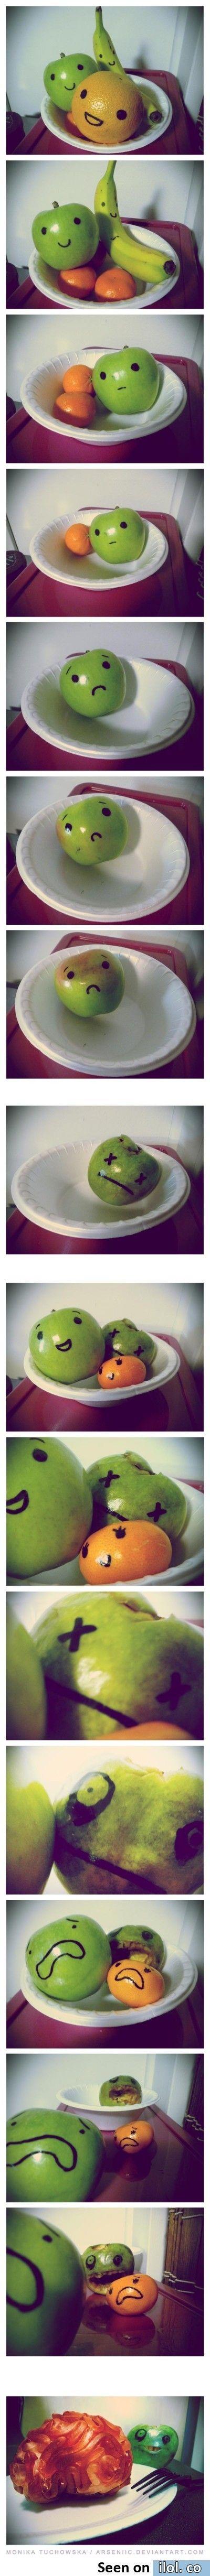 Fruit vs zombies - Um Fruit Vs Zombies Anyone